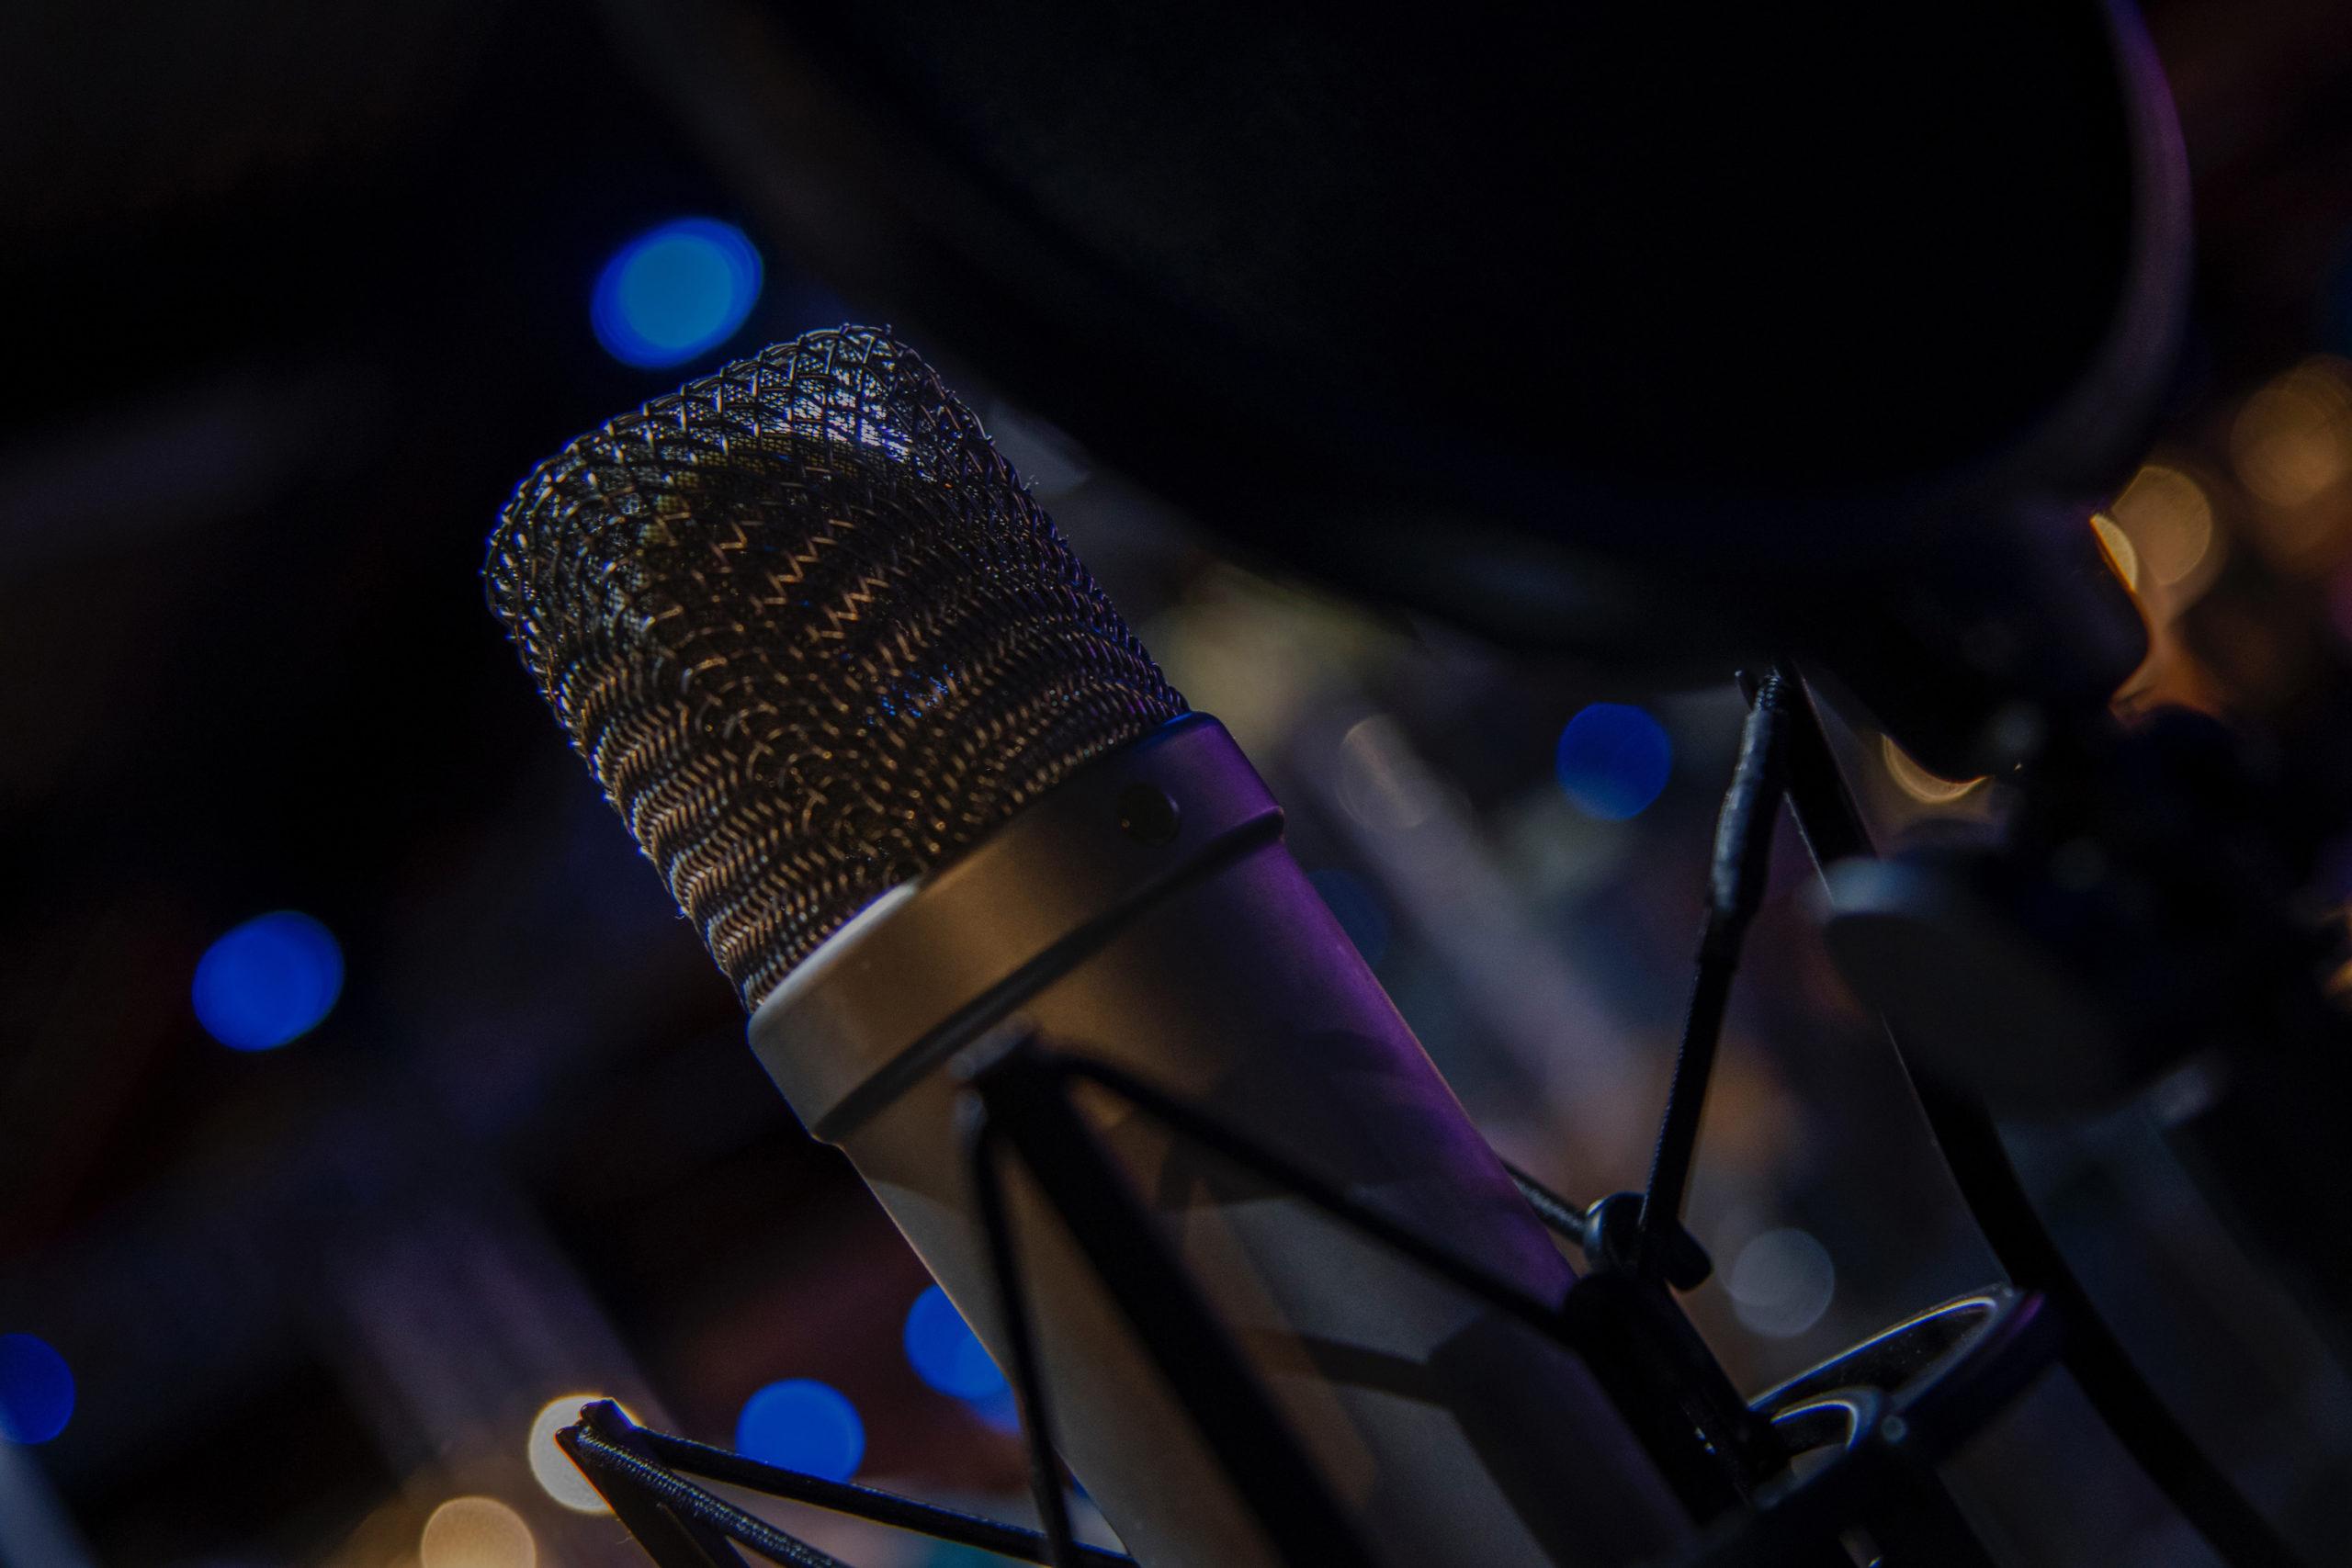 Radiothon